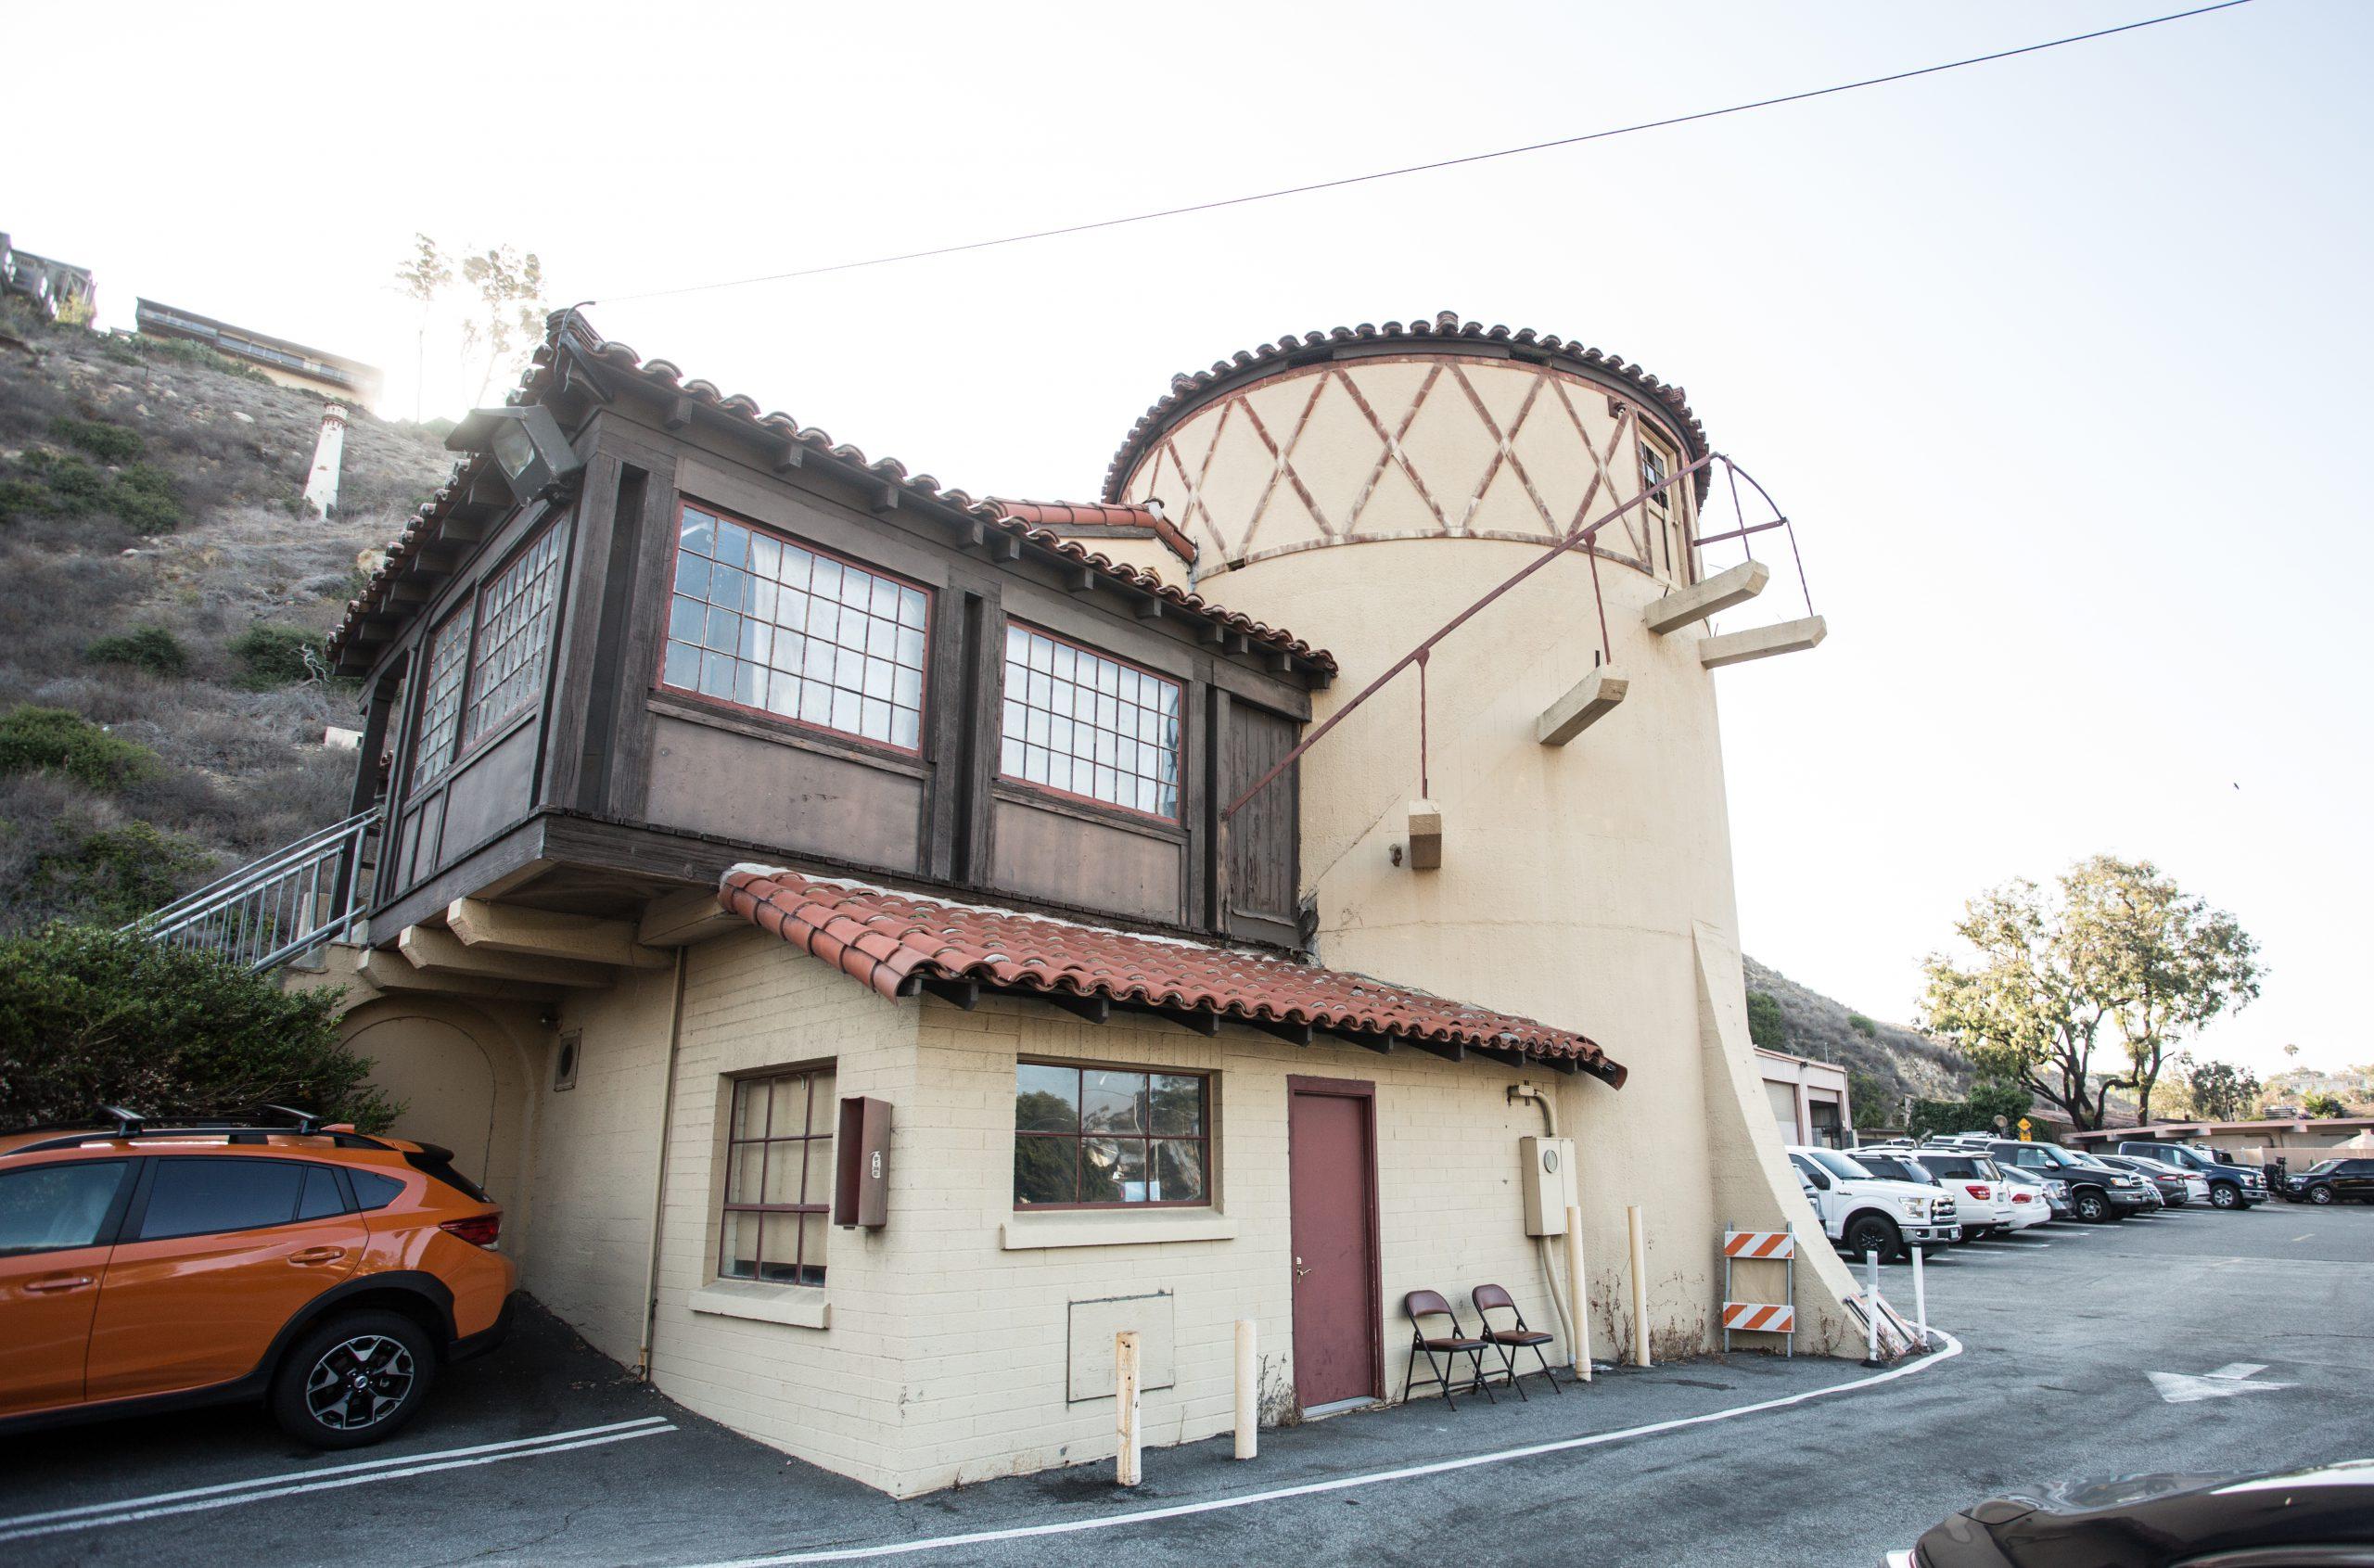 City Council OKs $930k to Preserve Historic Digester Building - Laguna Beach Local News